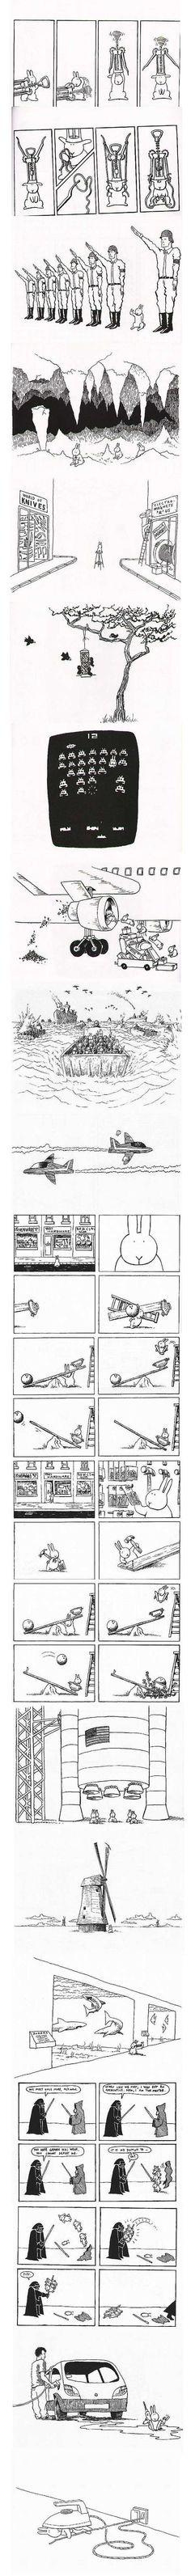 Suicide Bunny part 2